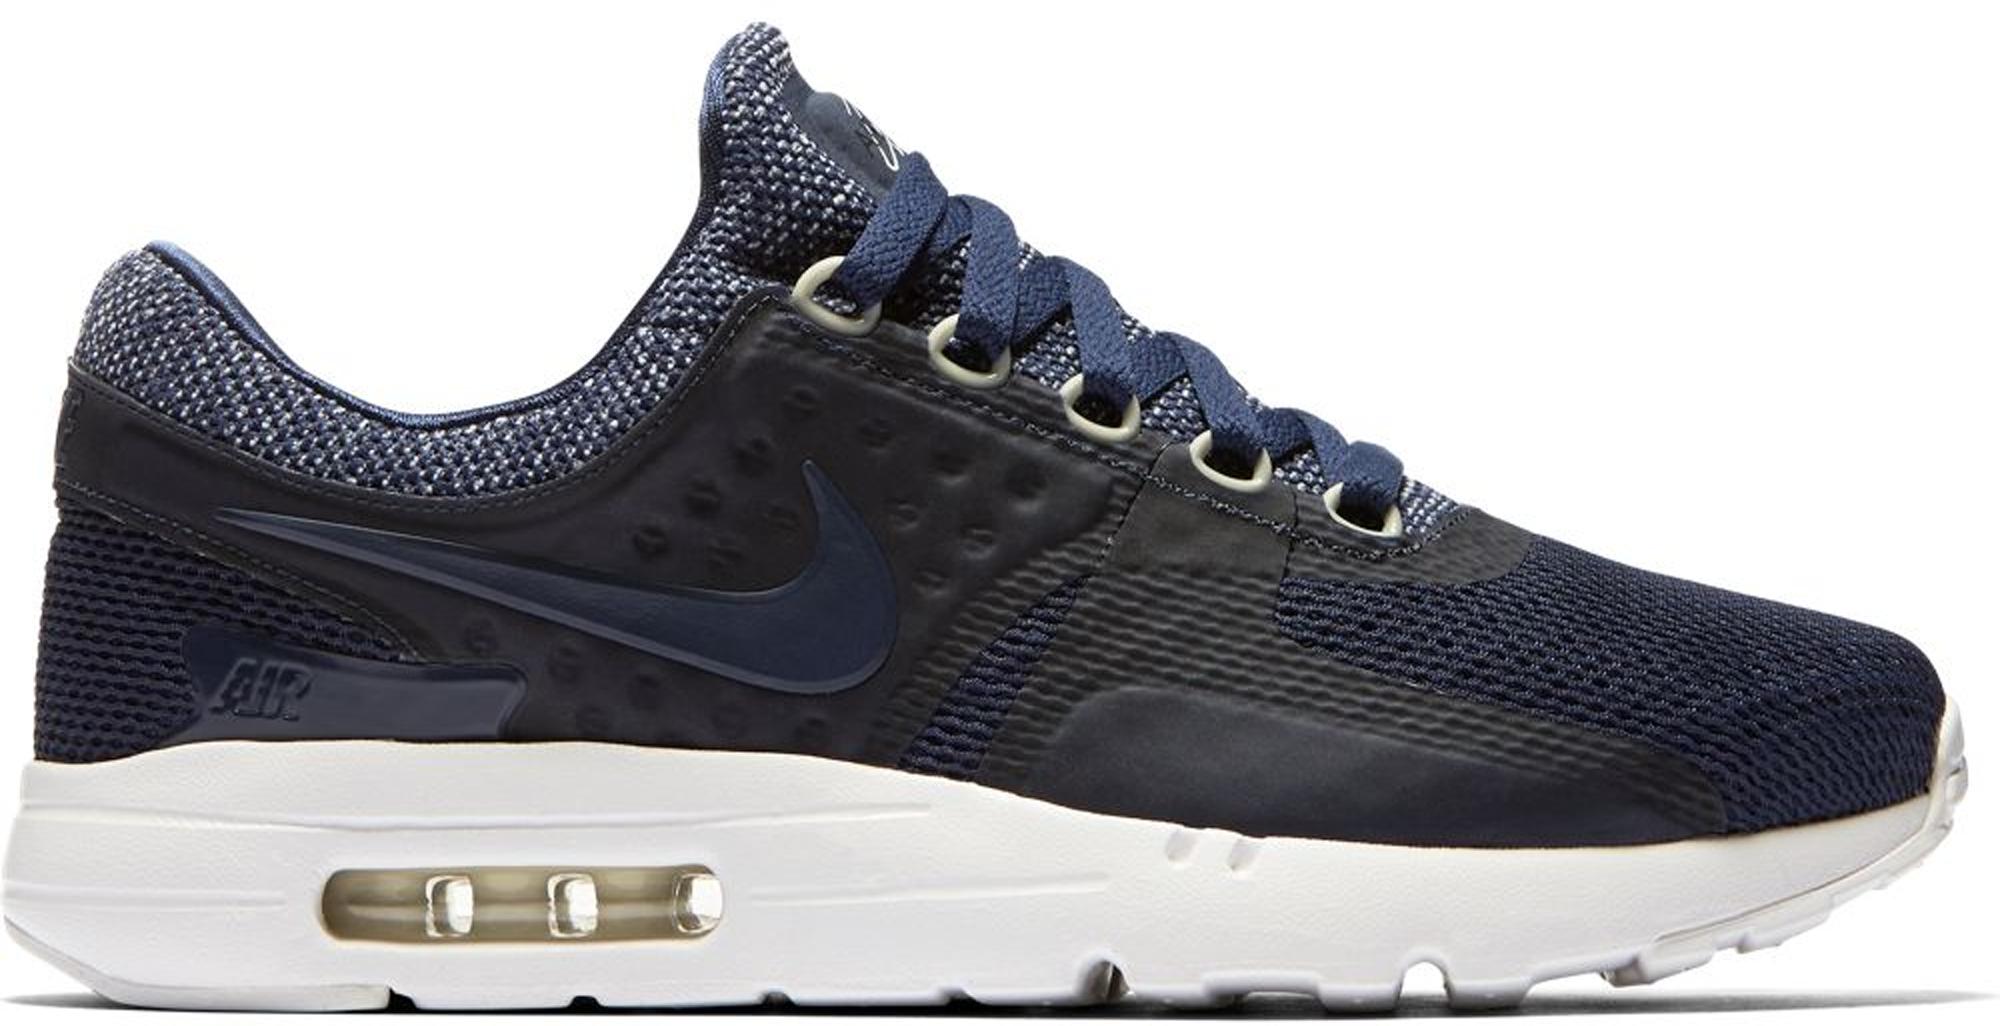 Nike Air Max Zero Midnight Navy Black